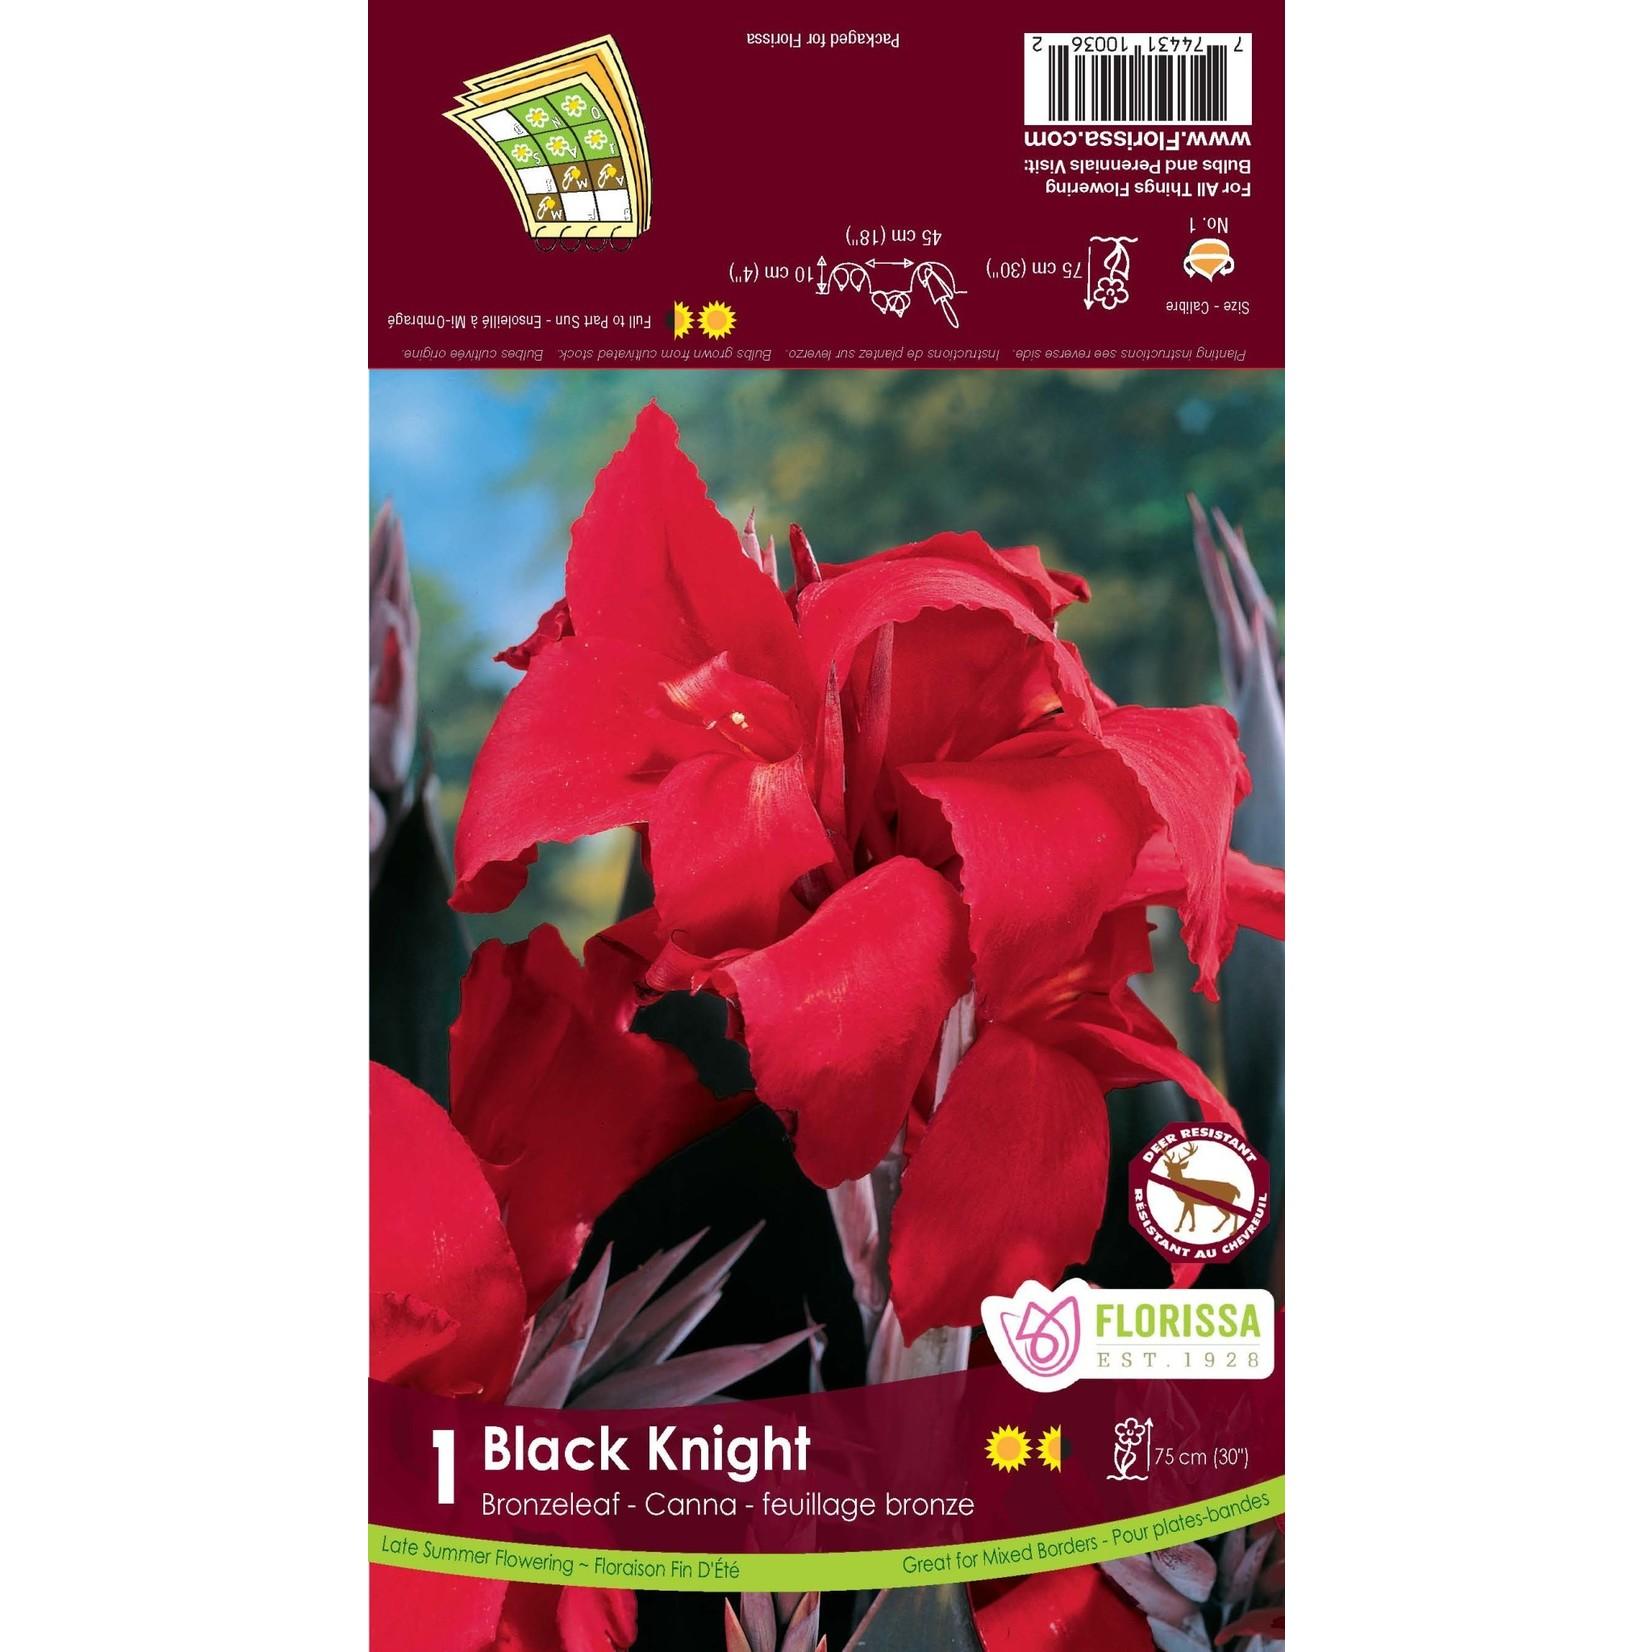 Canna Lilies (bulb pkg) - Bronzeleaf Black Knight (1 bulb)